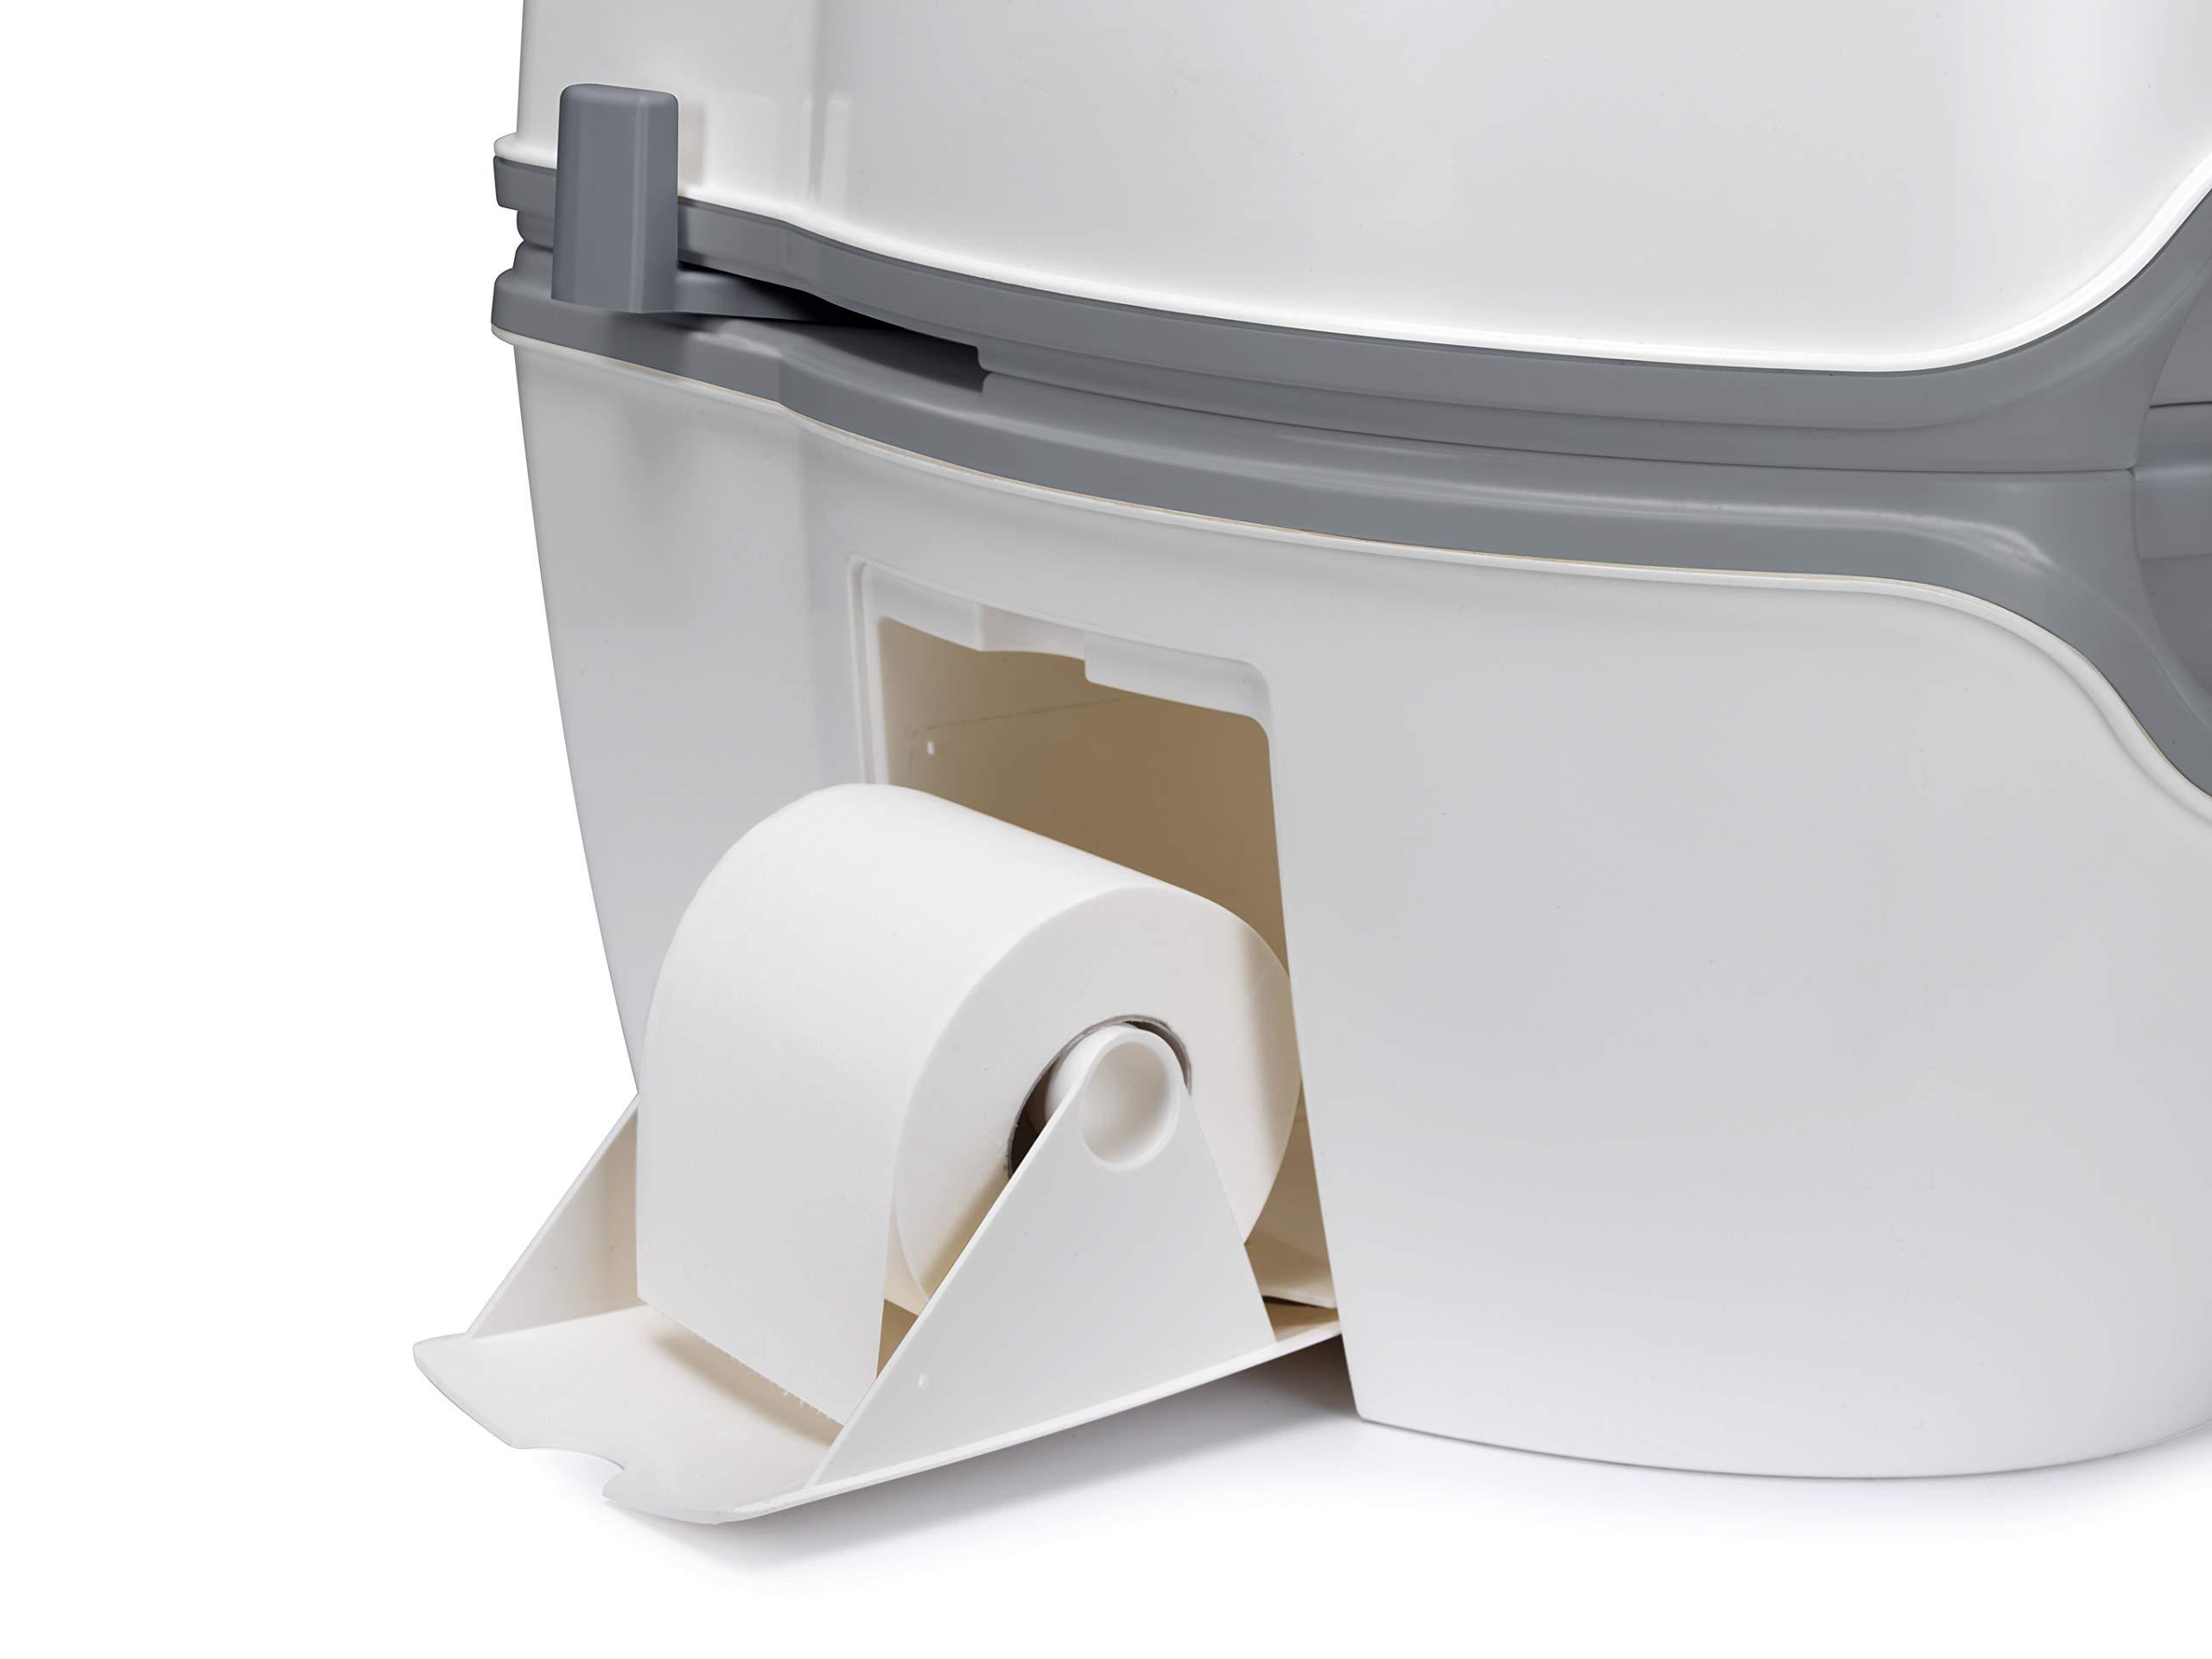 Thetford 92305 Porta Potti 565P Excellence Portable Toilet (Manual), 448 x 388 x 450 mm 6